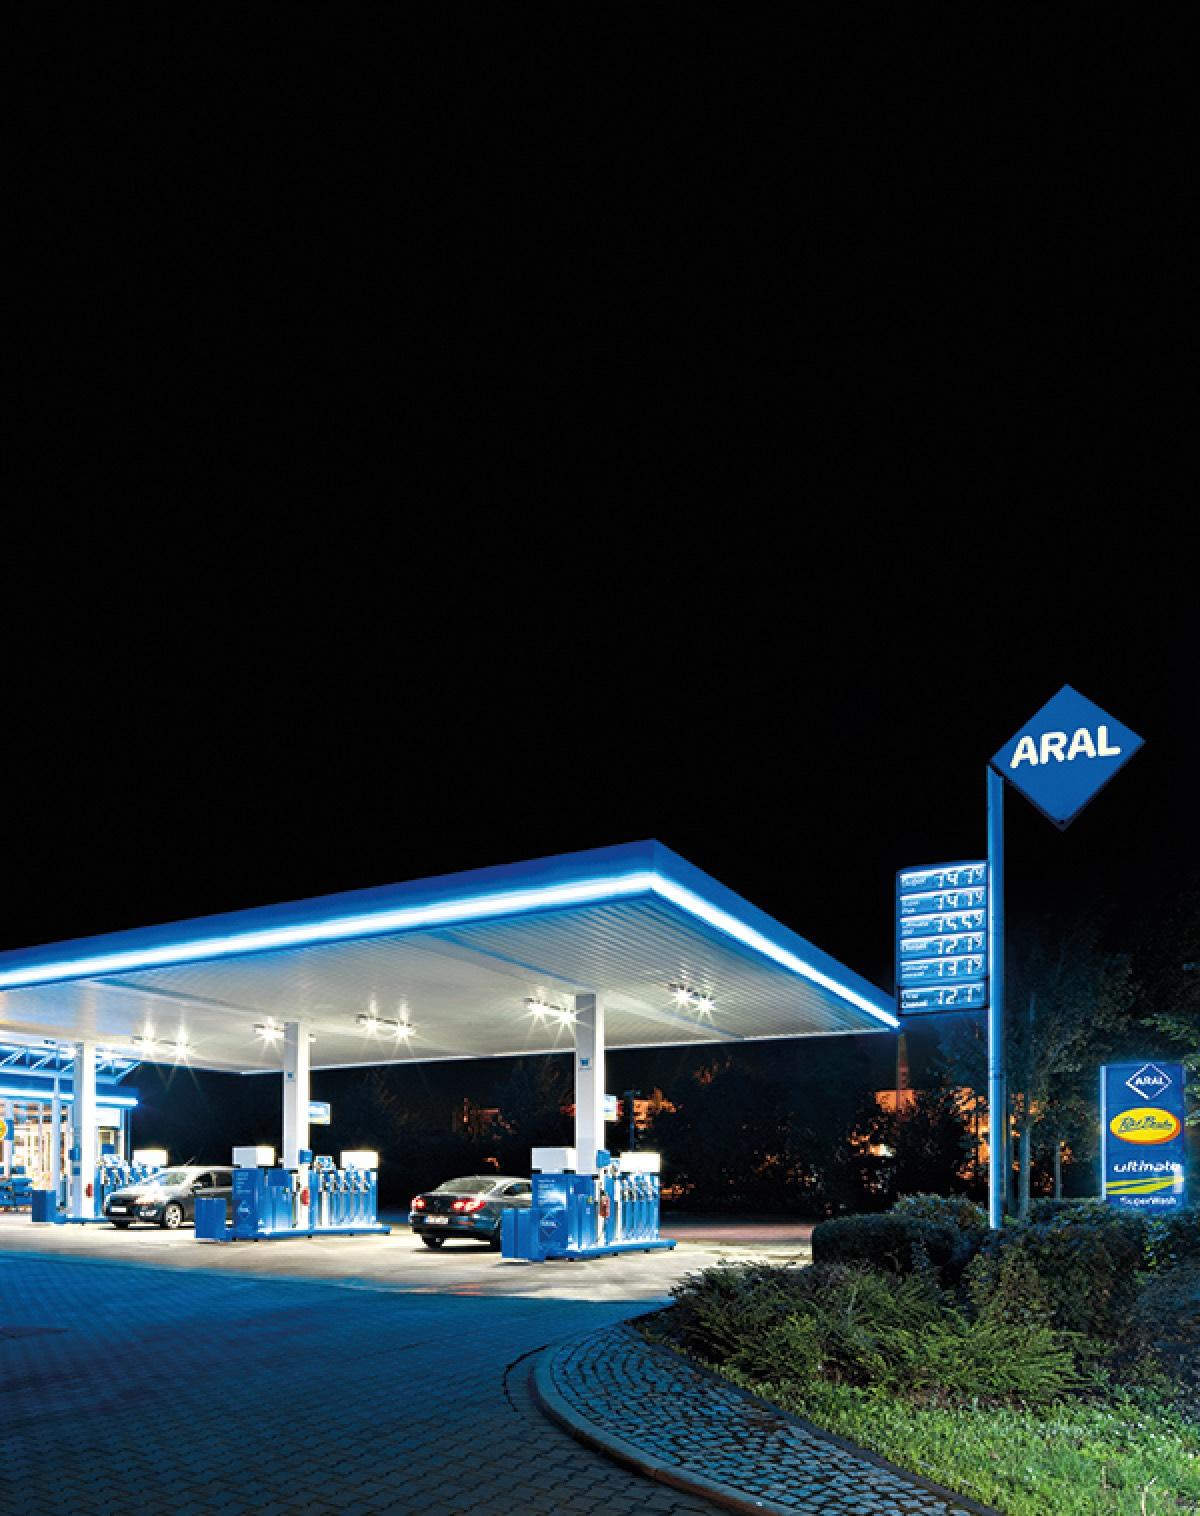 [Payback] Aral 2 Cent pro Liter sparen | bis maximal 50 Liter